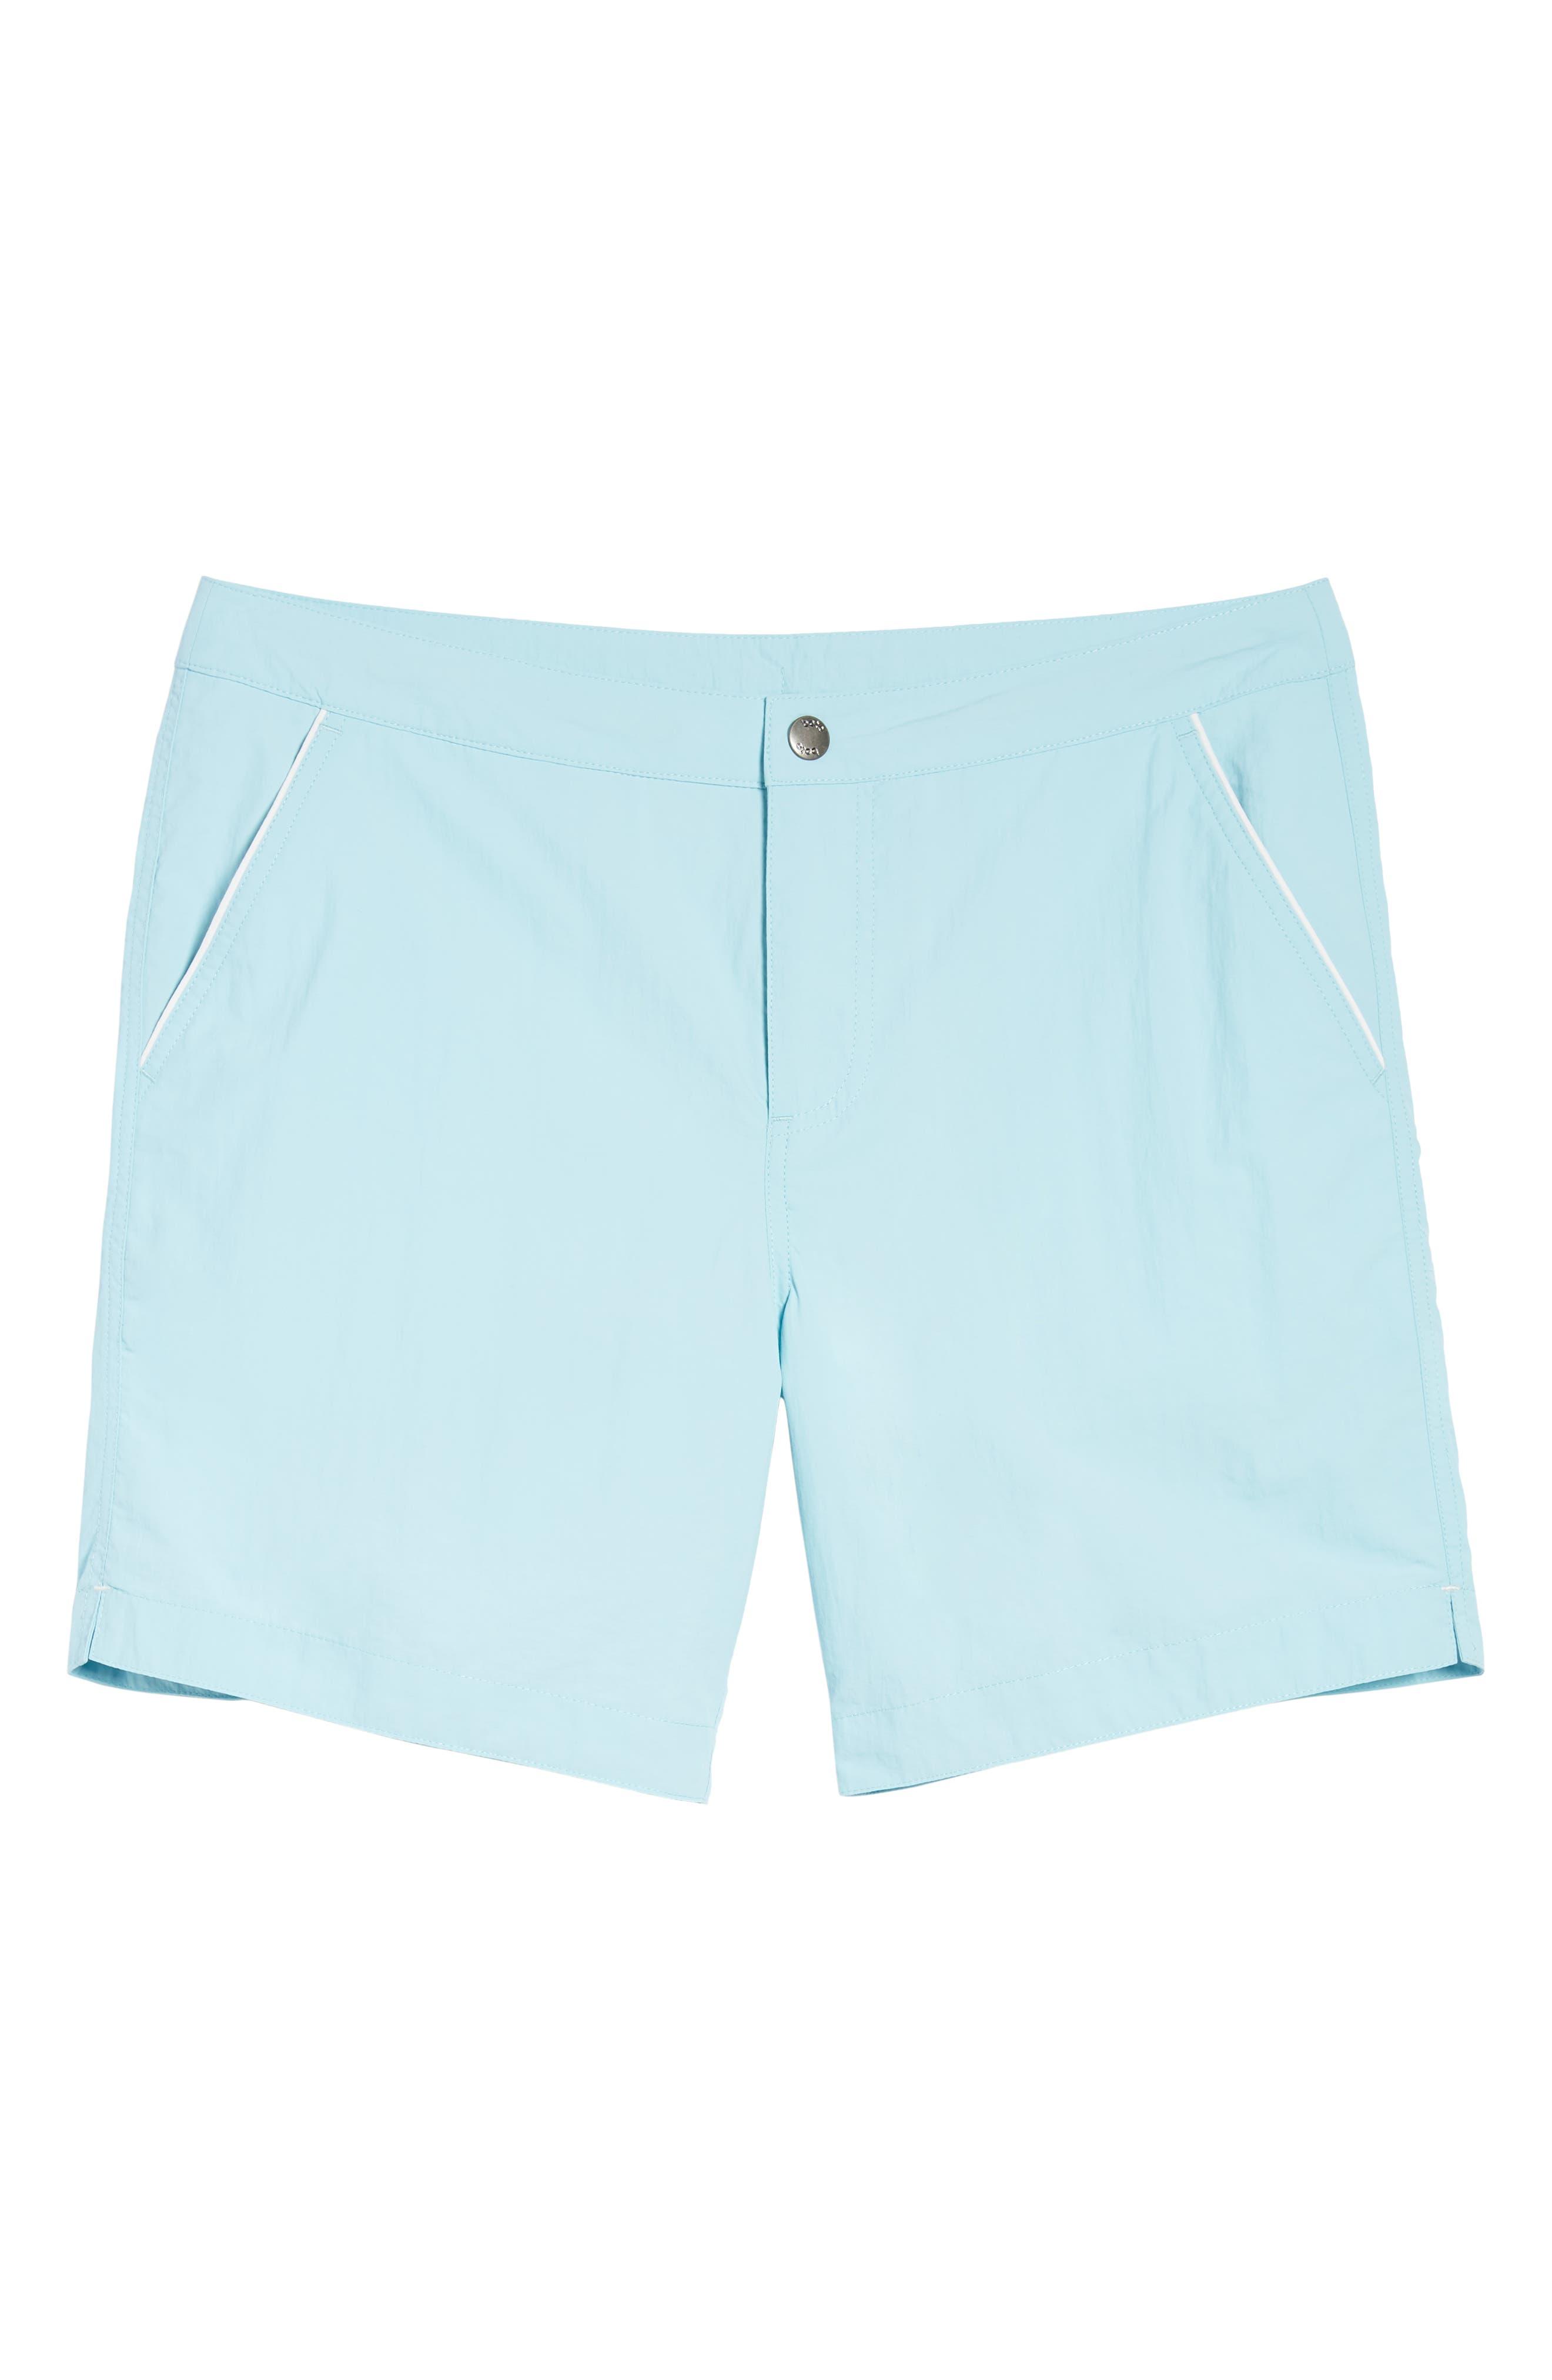 Rio Slim Fit Swim Trunks,                             Alternate thumbnail 6, color,                             Aqua Blue